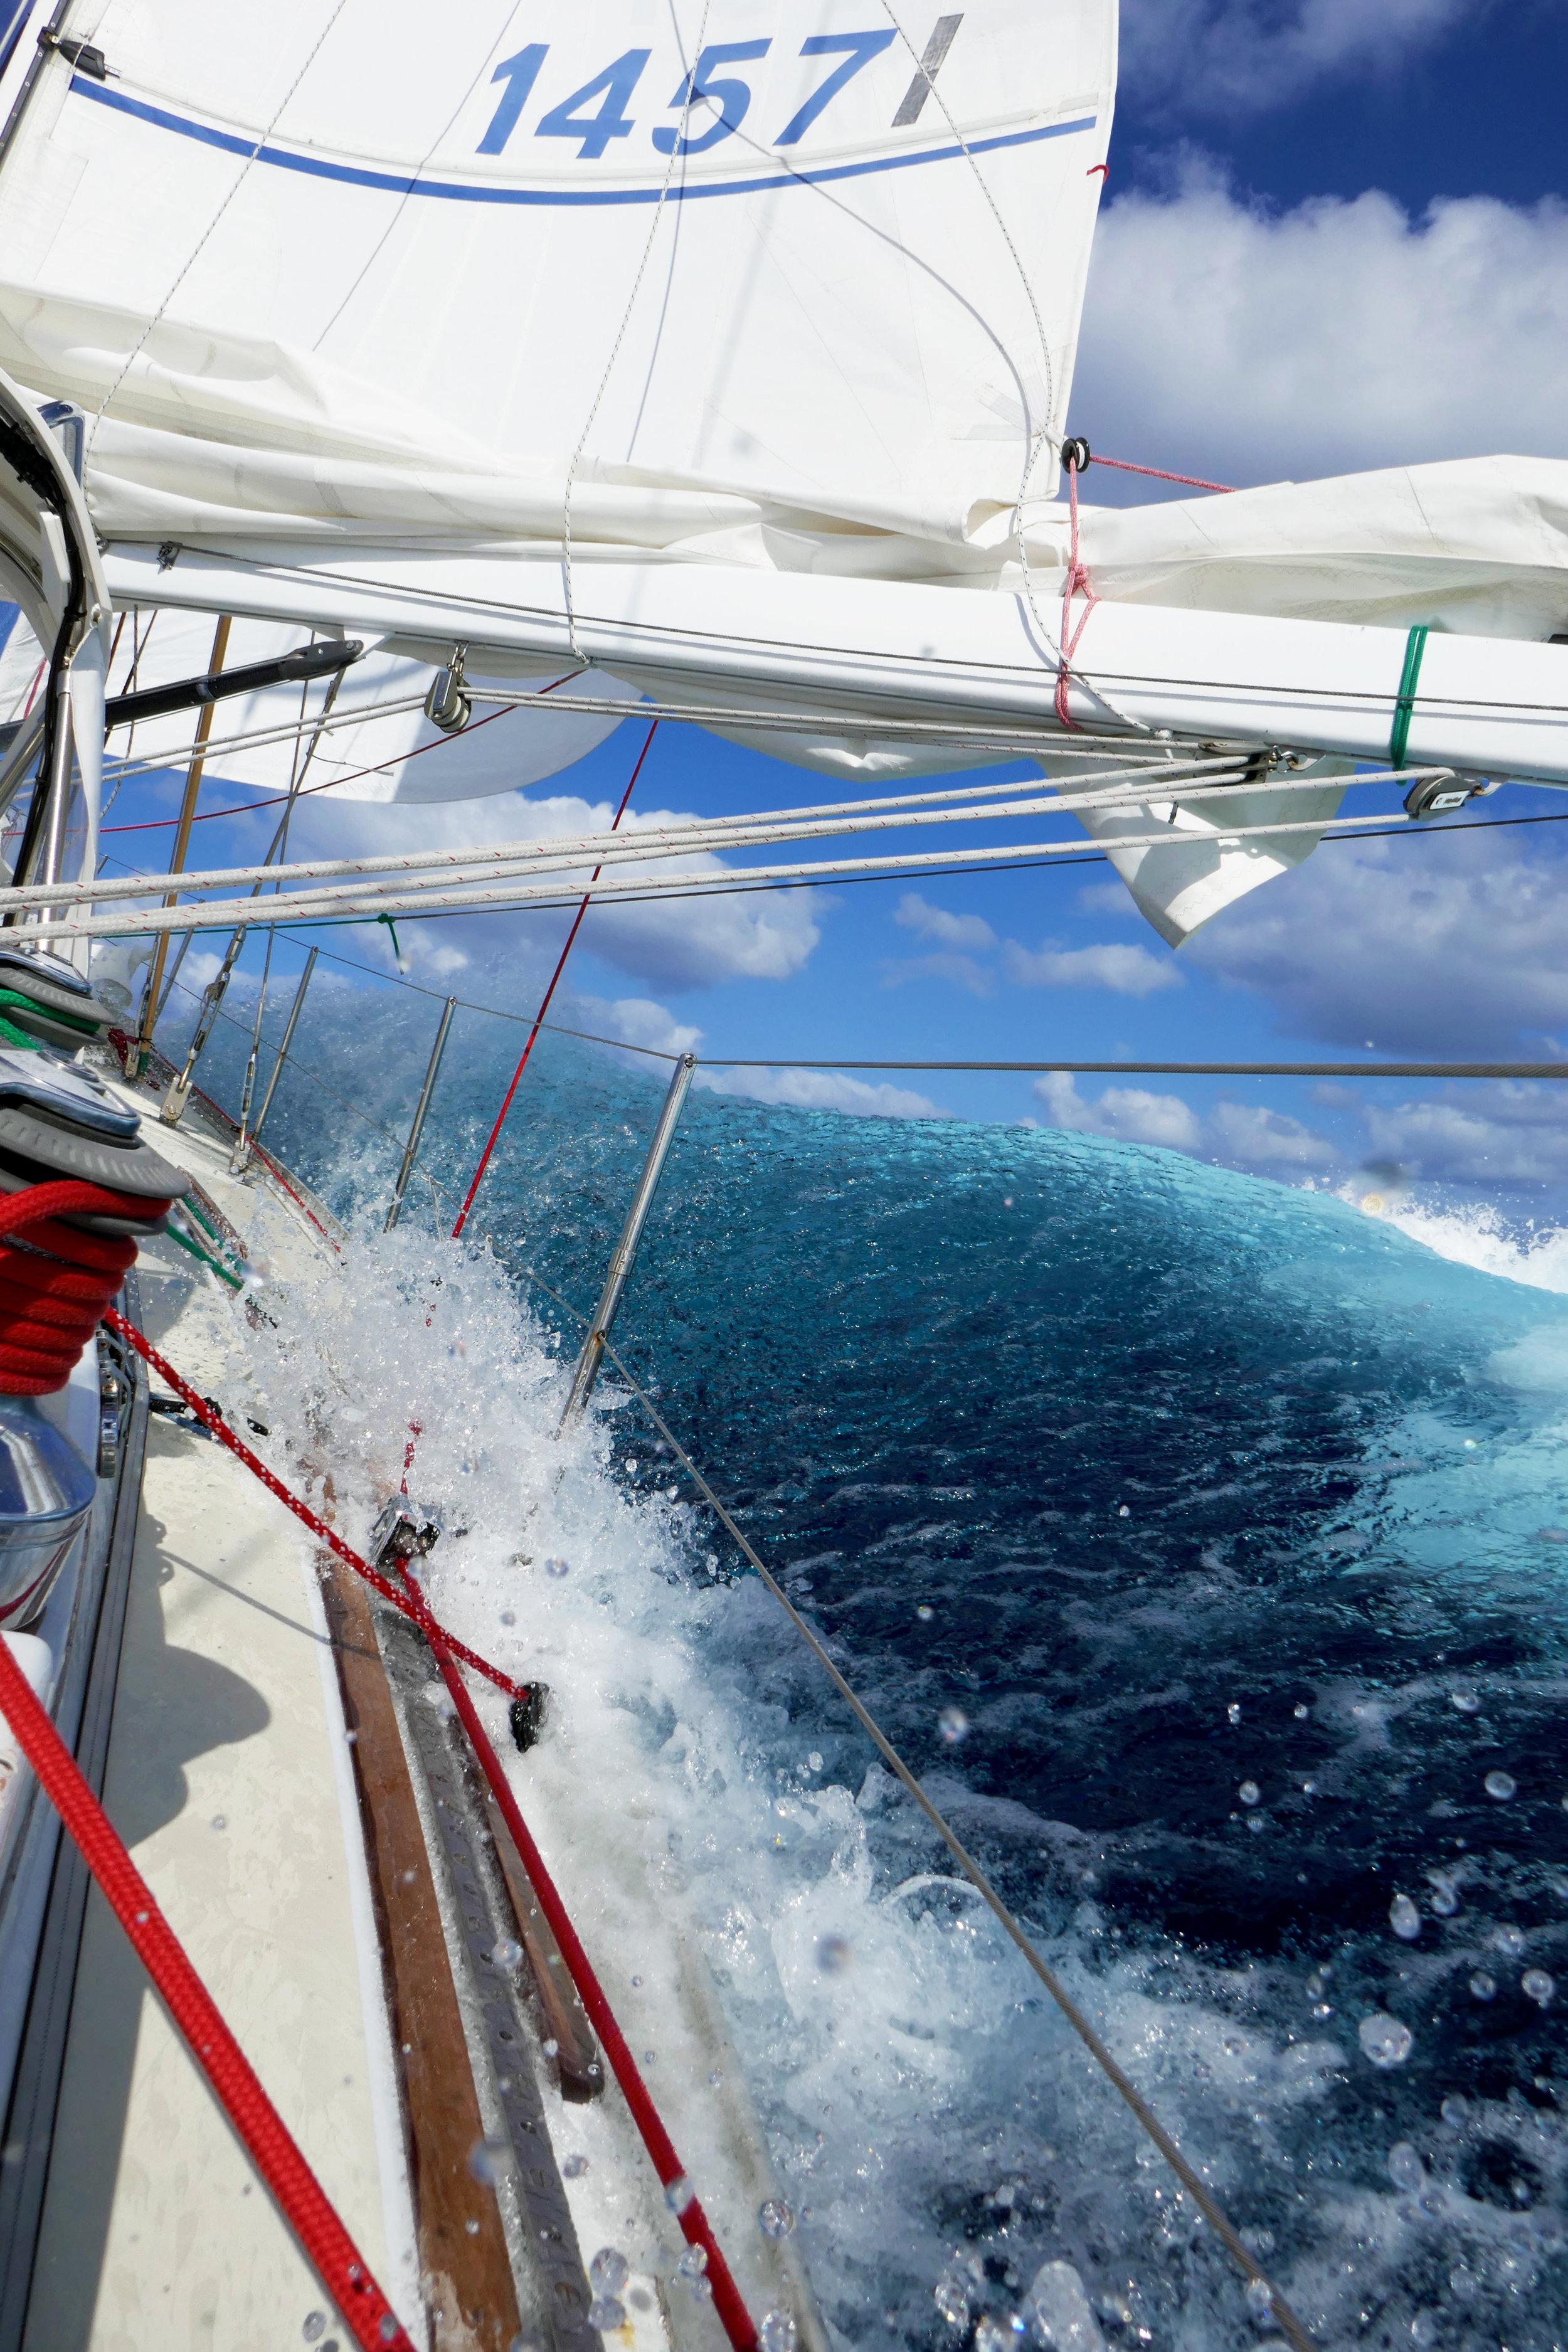 High seas en route across the Atlantic in 2017!